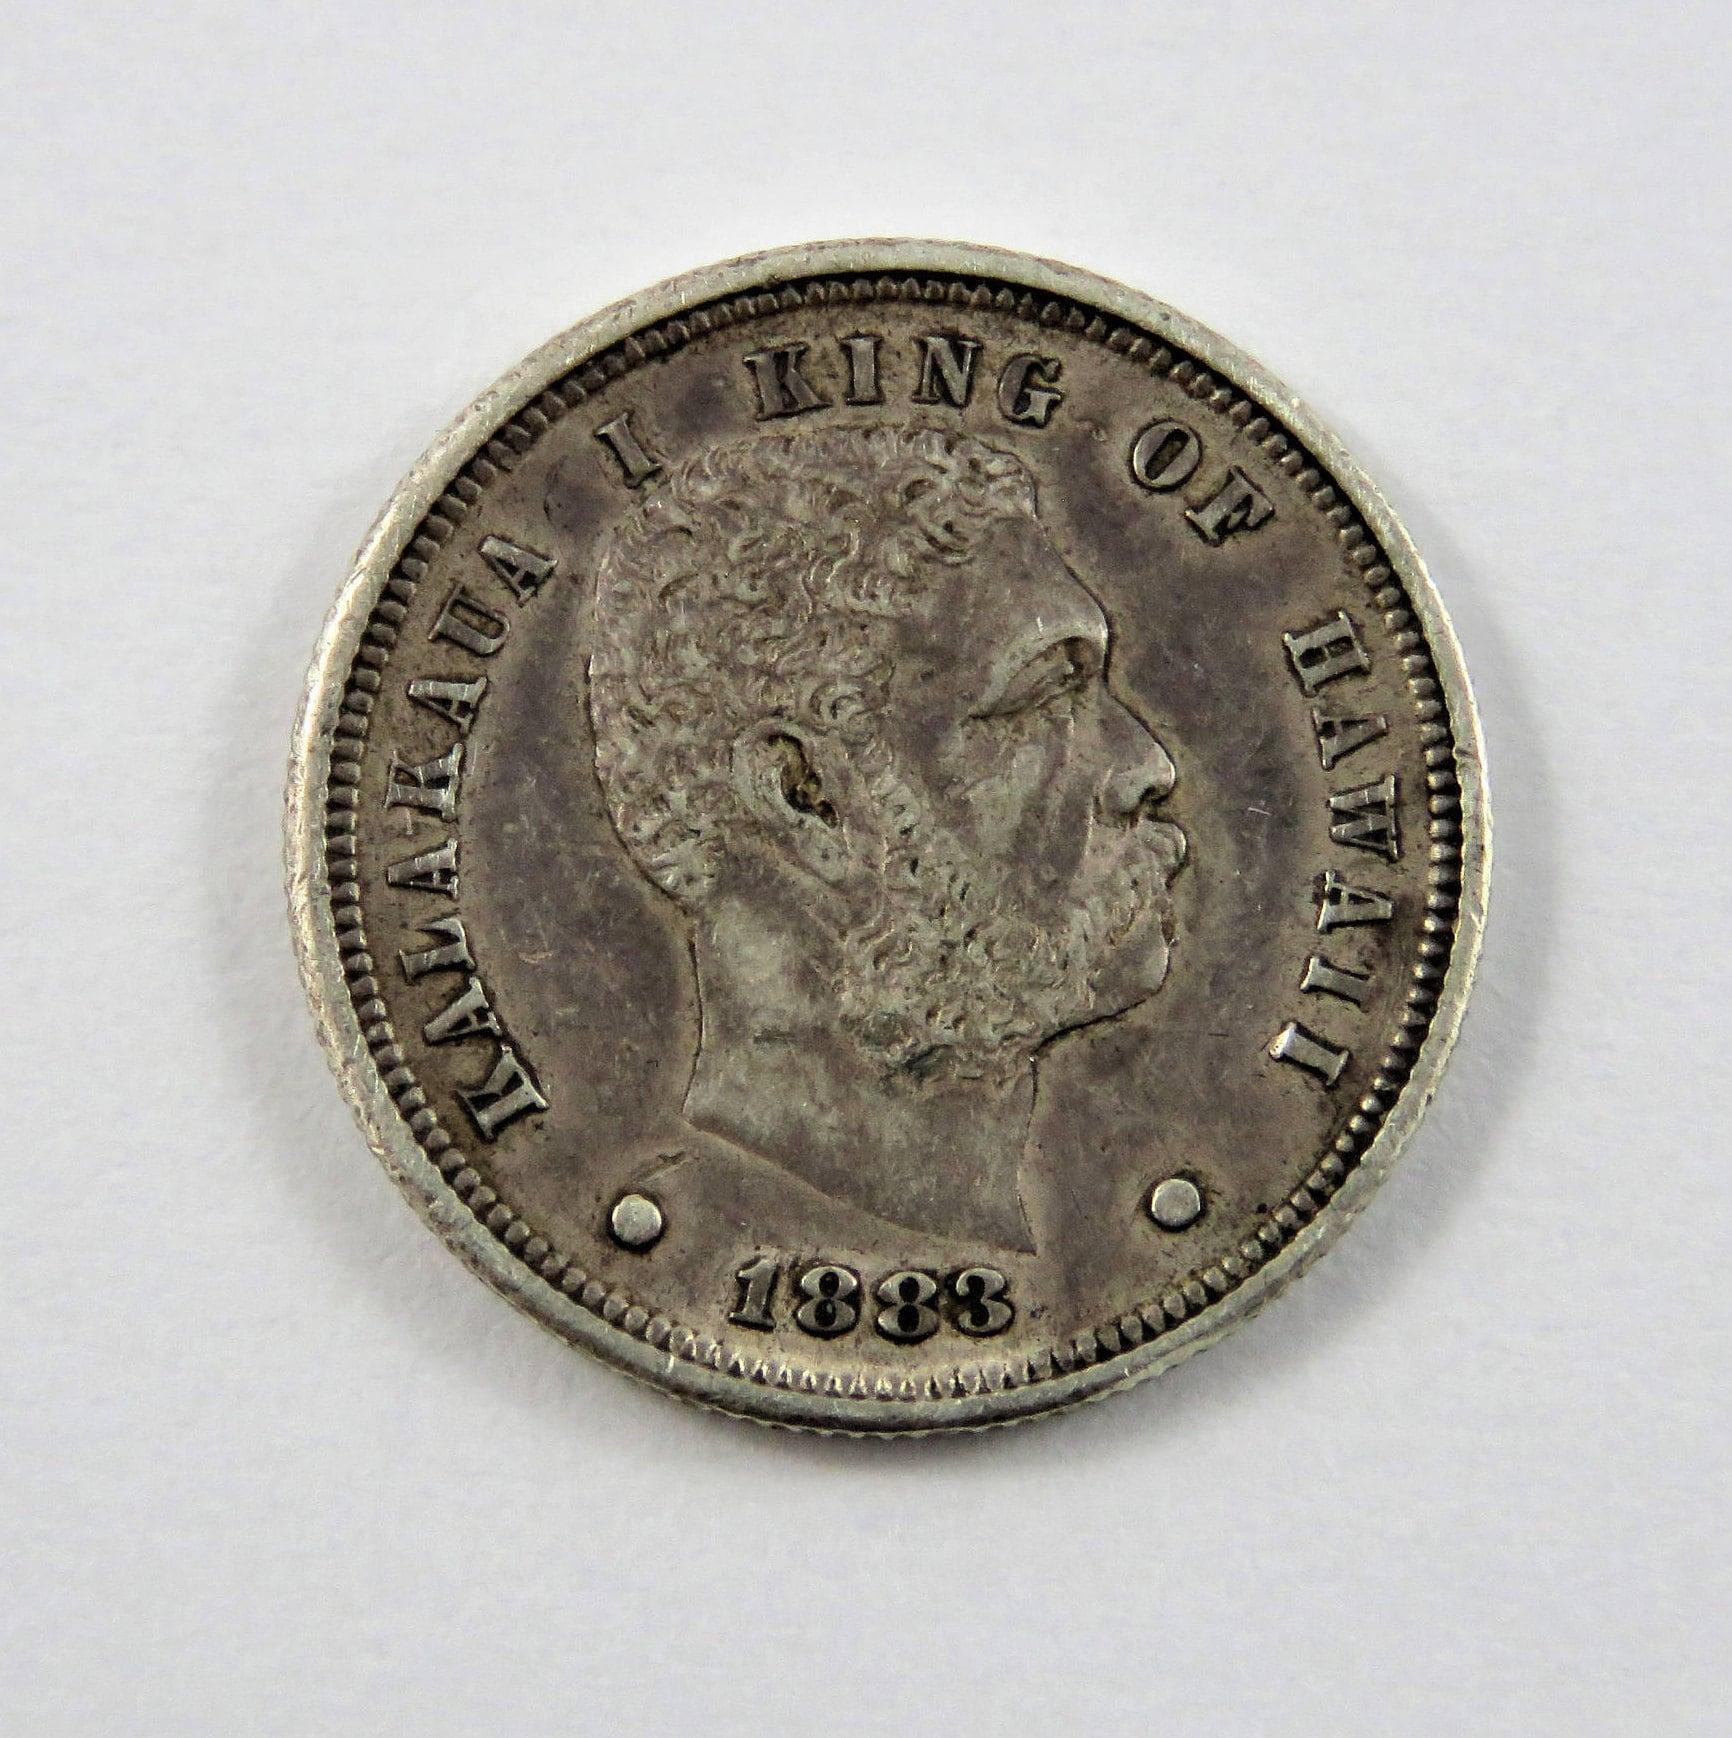 Hawaii Usa 1883 Silber 10 Cent Münze Umi Keneta Ef Etsy